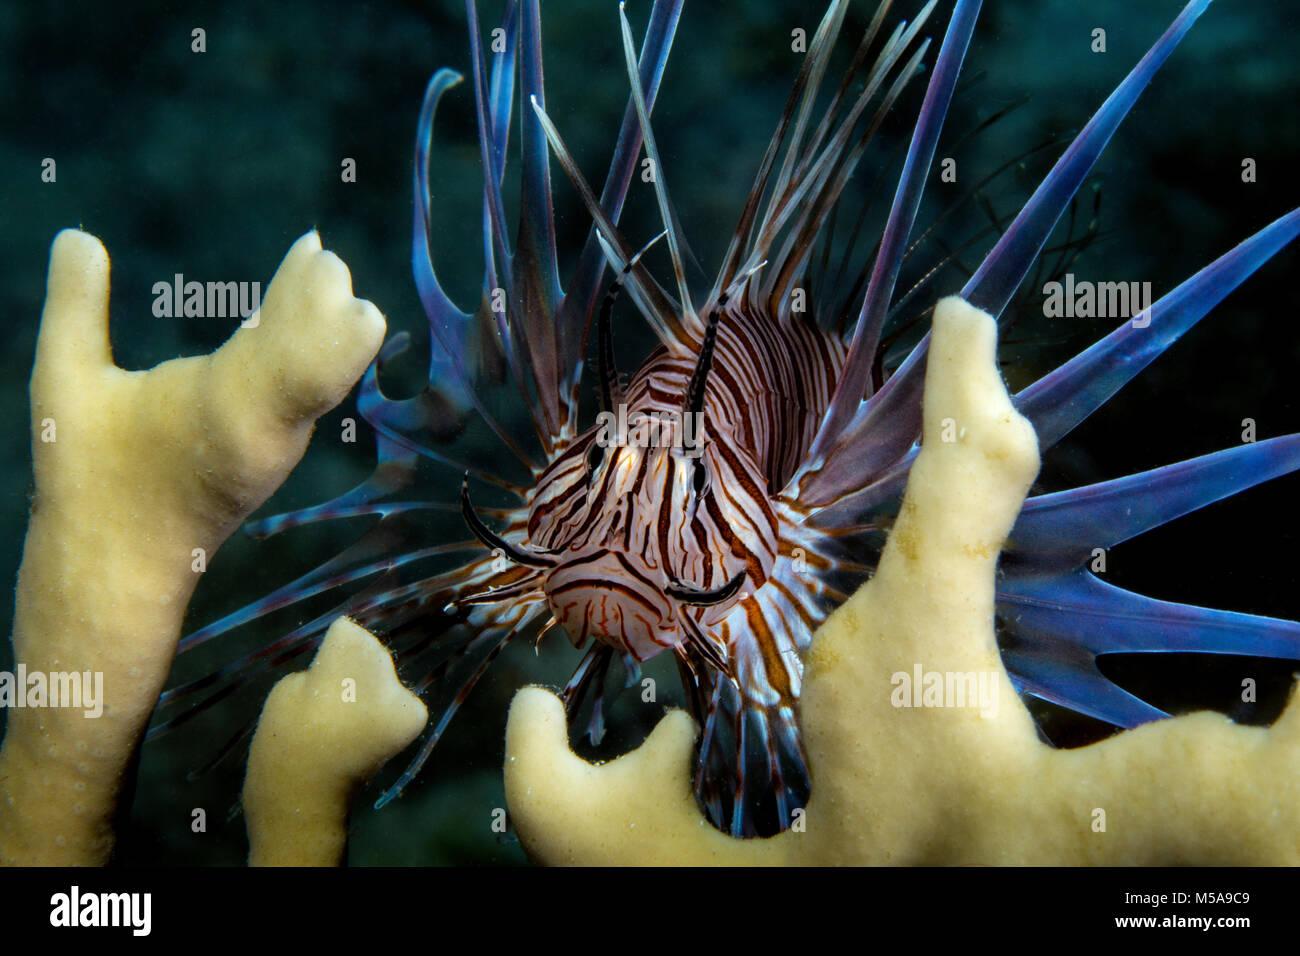 The invasive species, Lionfish (Pterois volitans) amid fire coral plants. - Stock Image